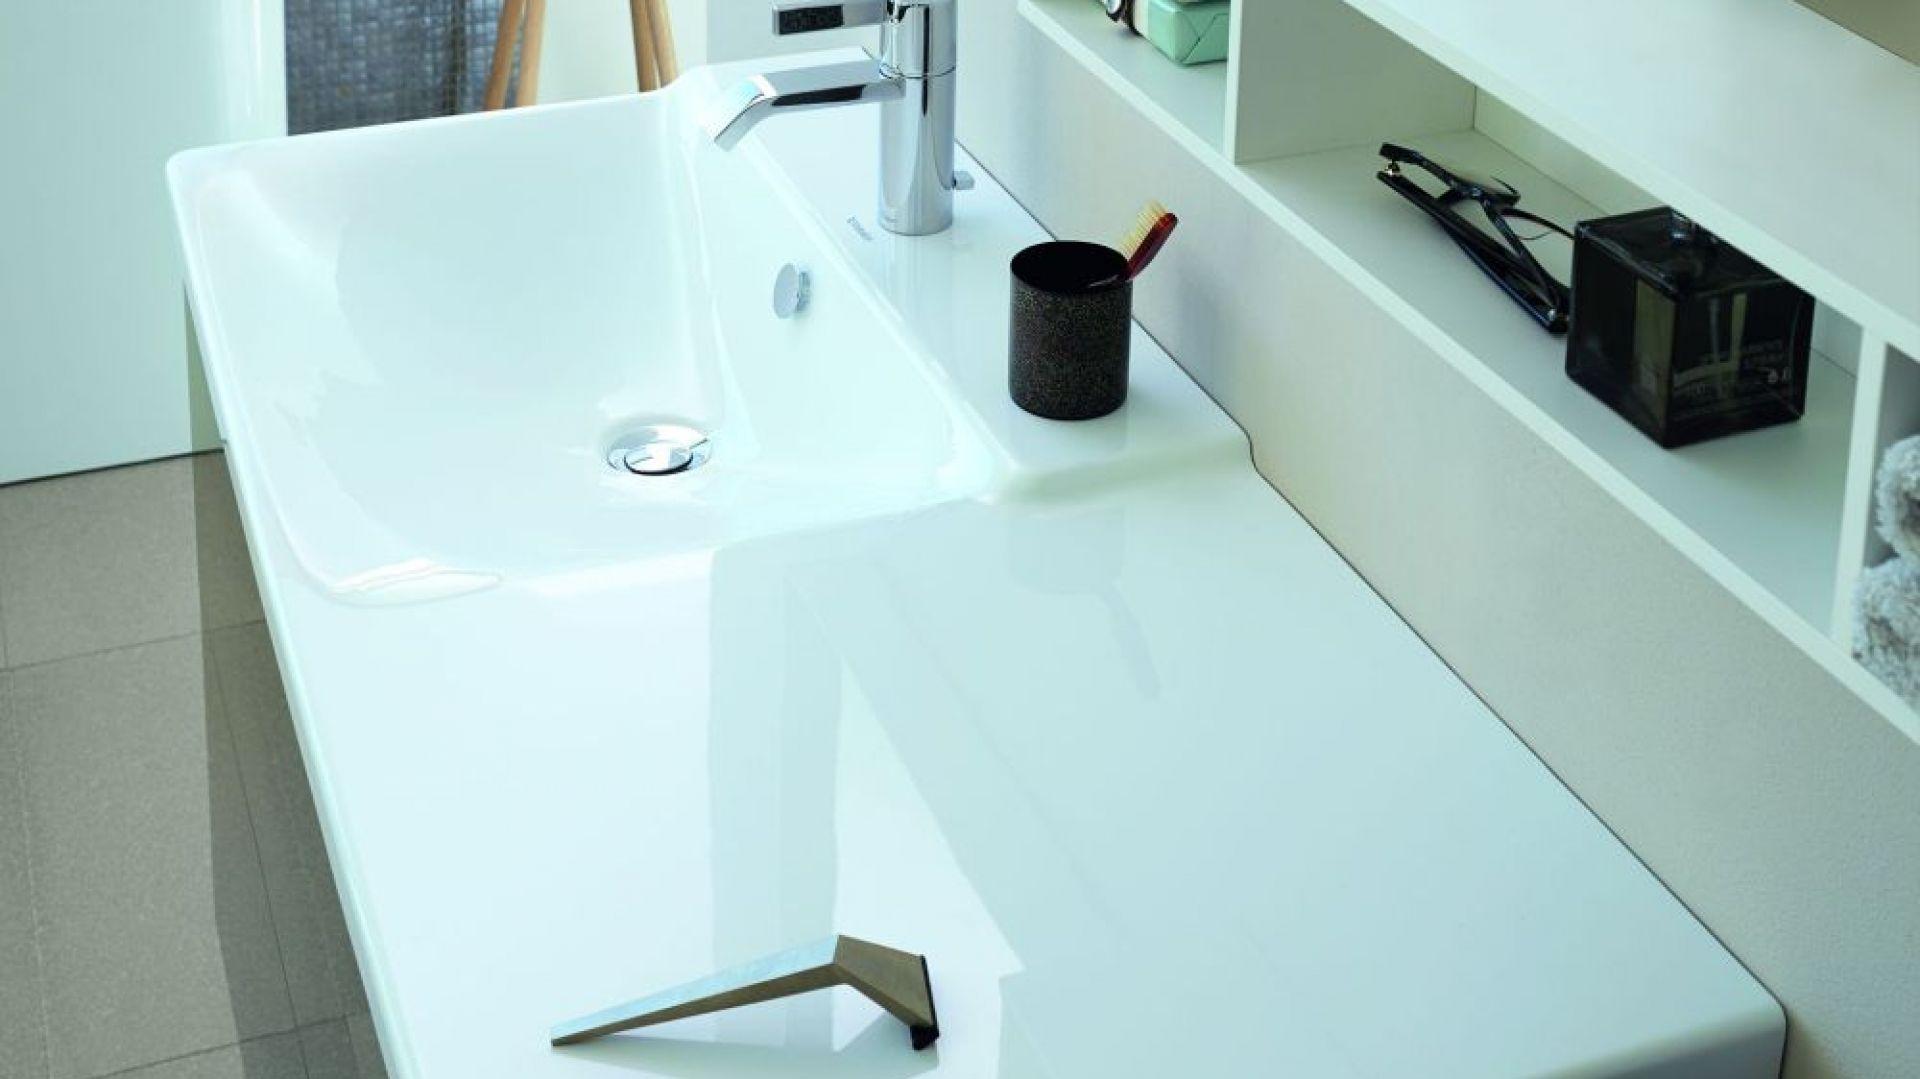 Umywalka z serii P3 Comforts z długim, funkcjonalnym blatem marki Duravit. Fot. Duravit